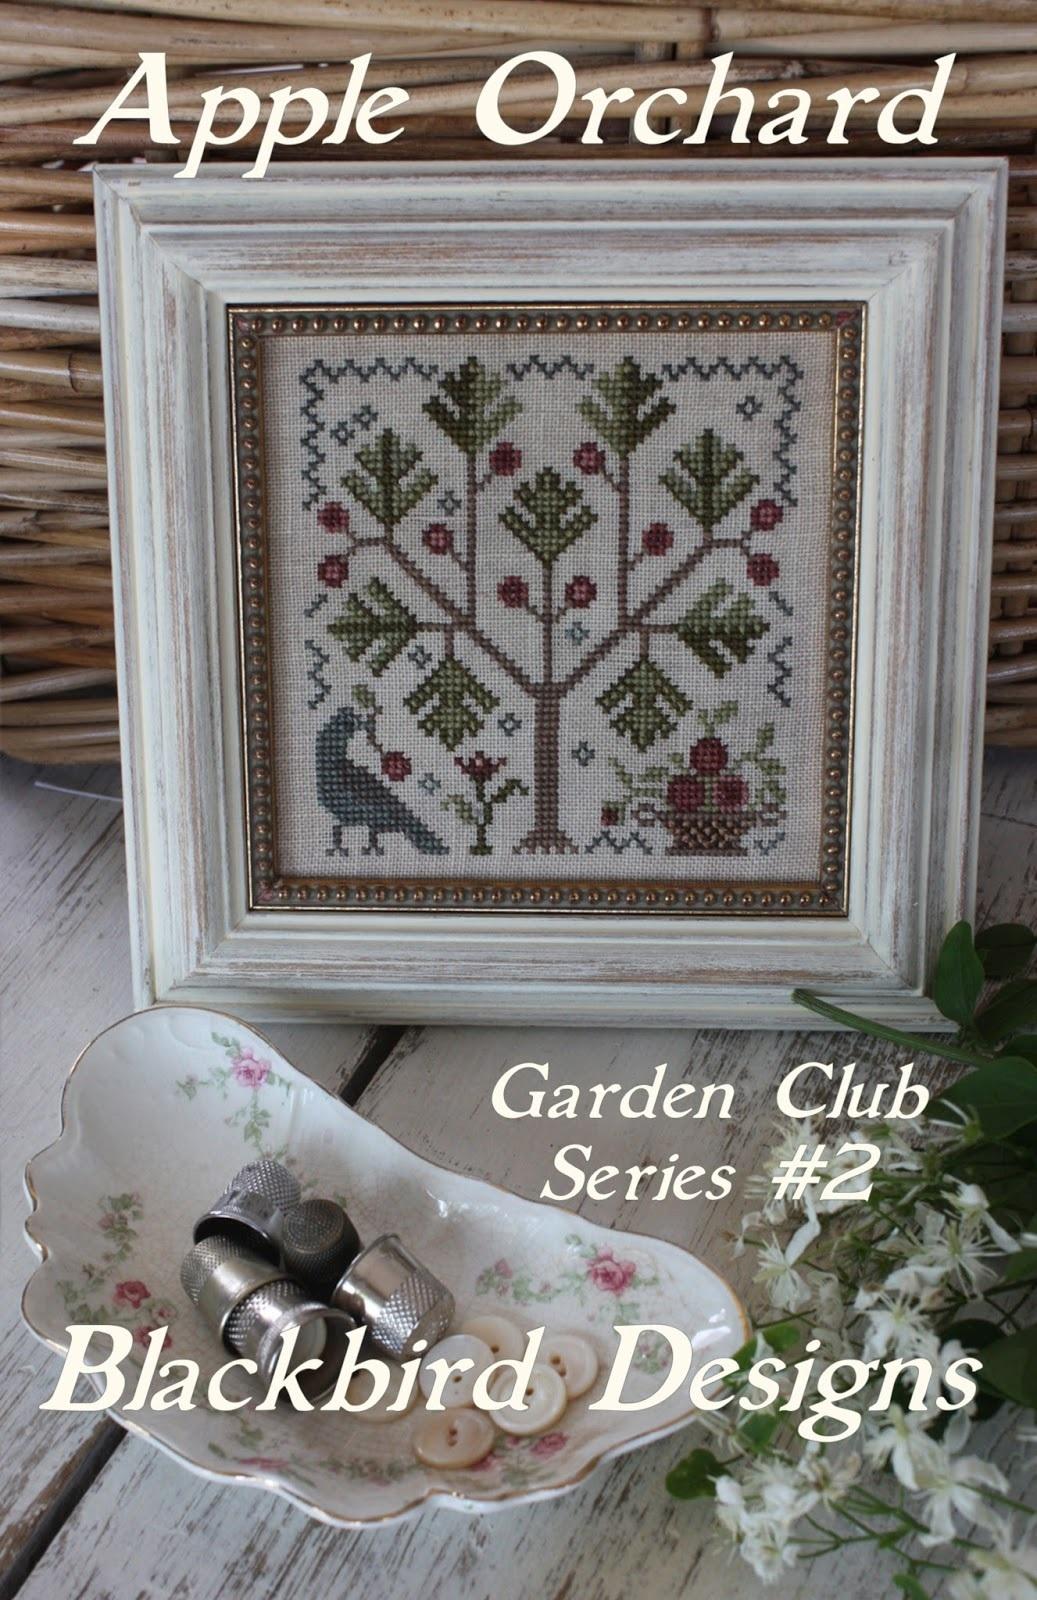 Apple orchard 2 garden club series cross stitch chart for Garden club book by blackbird designs